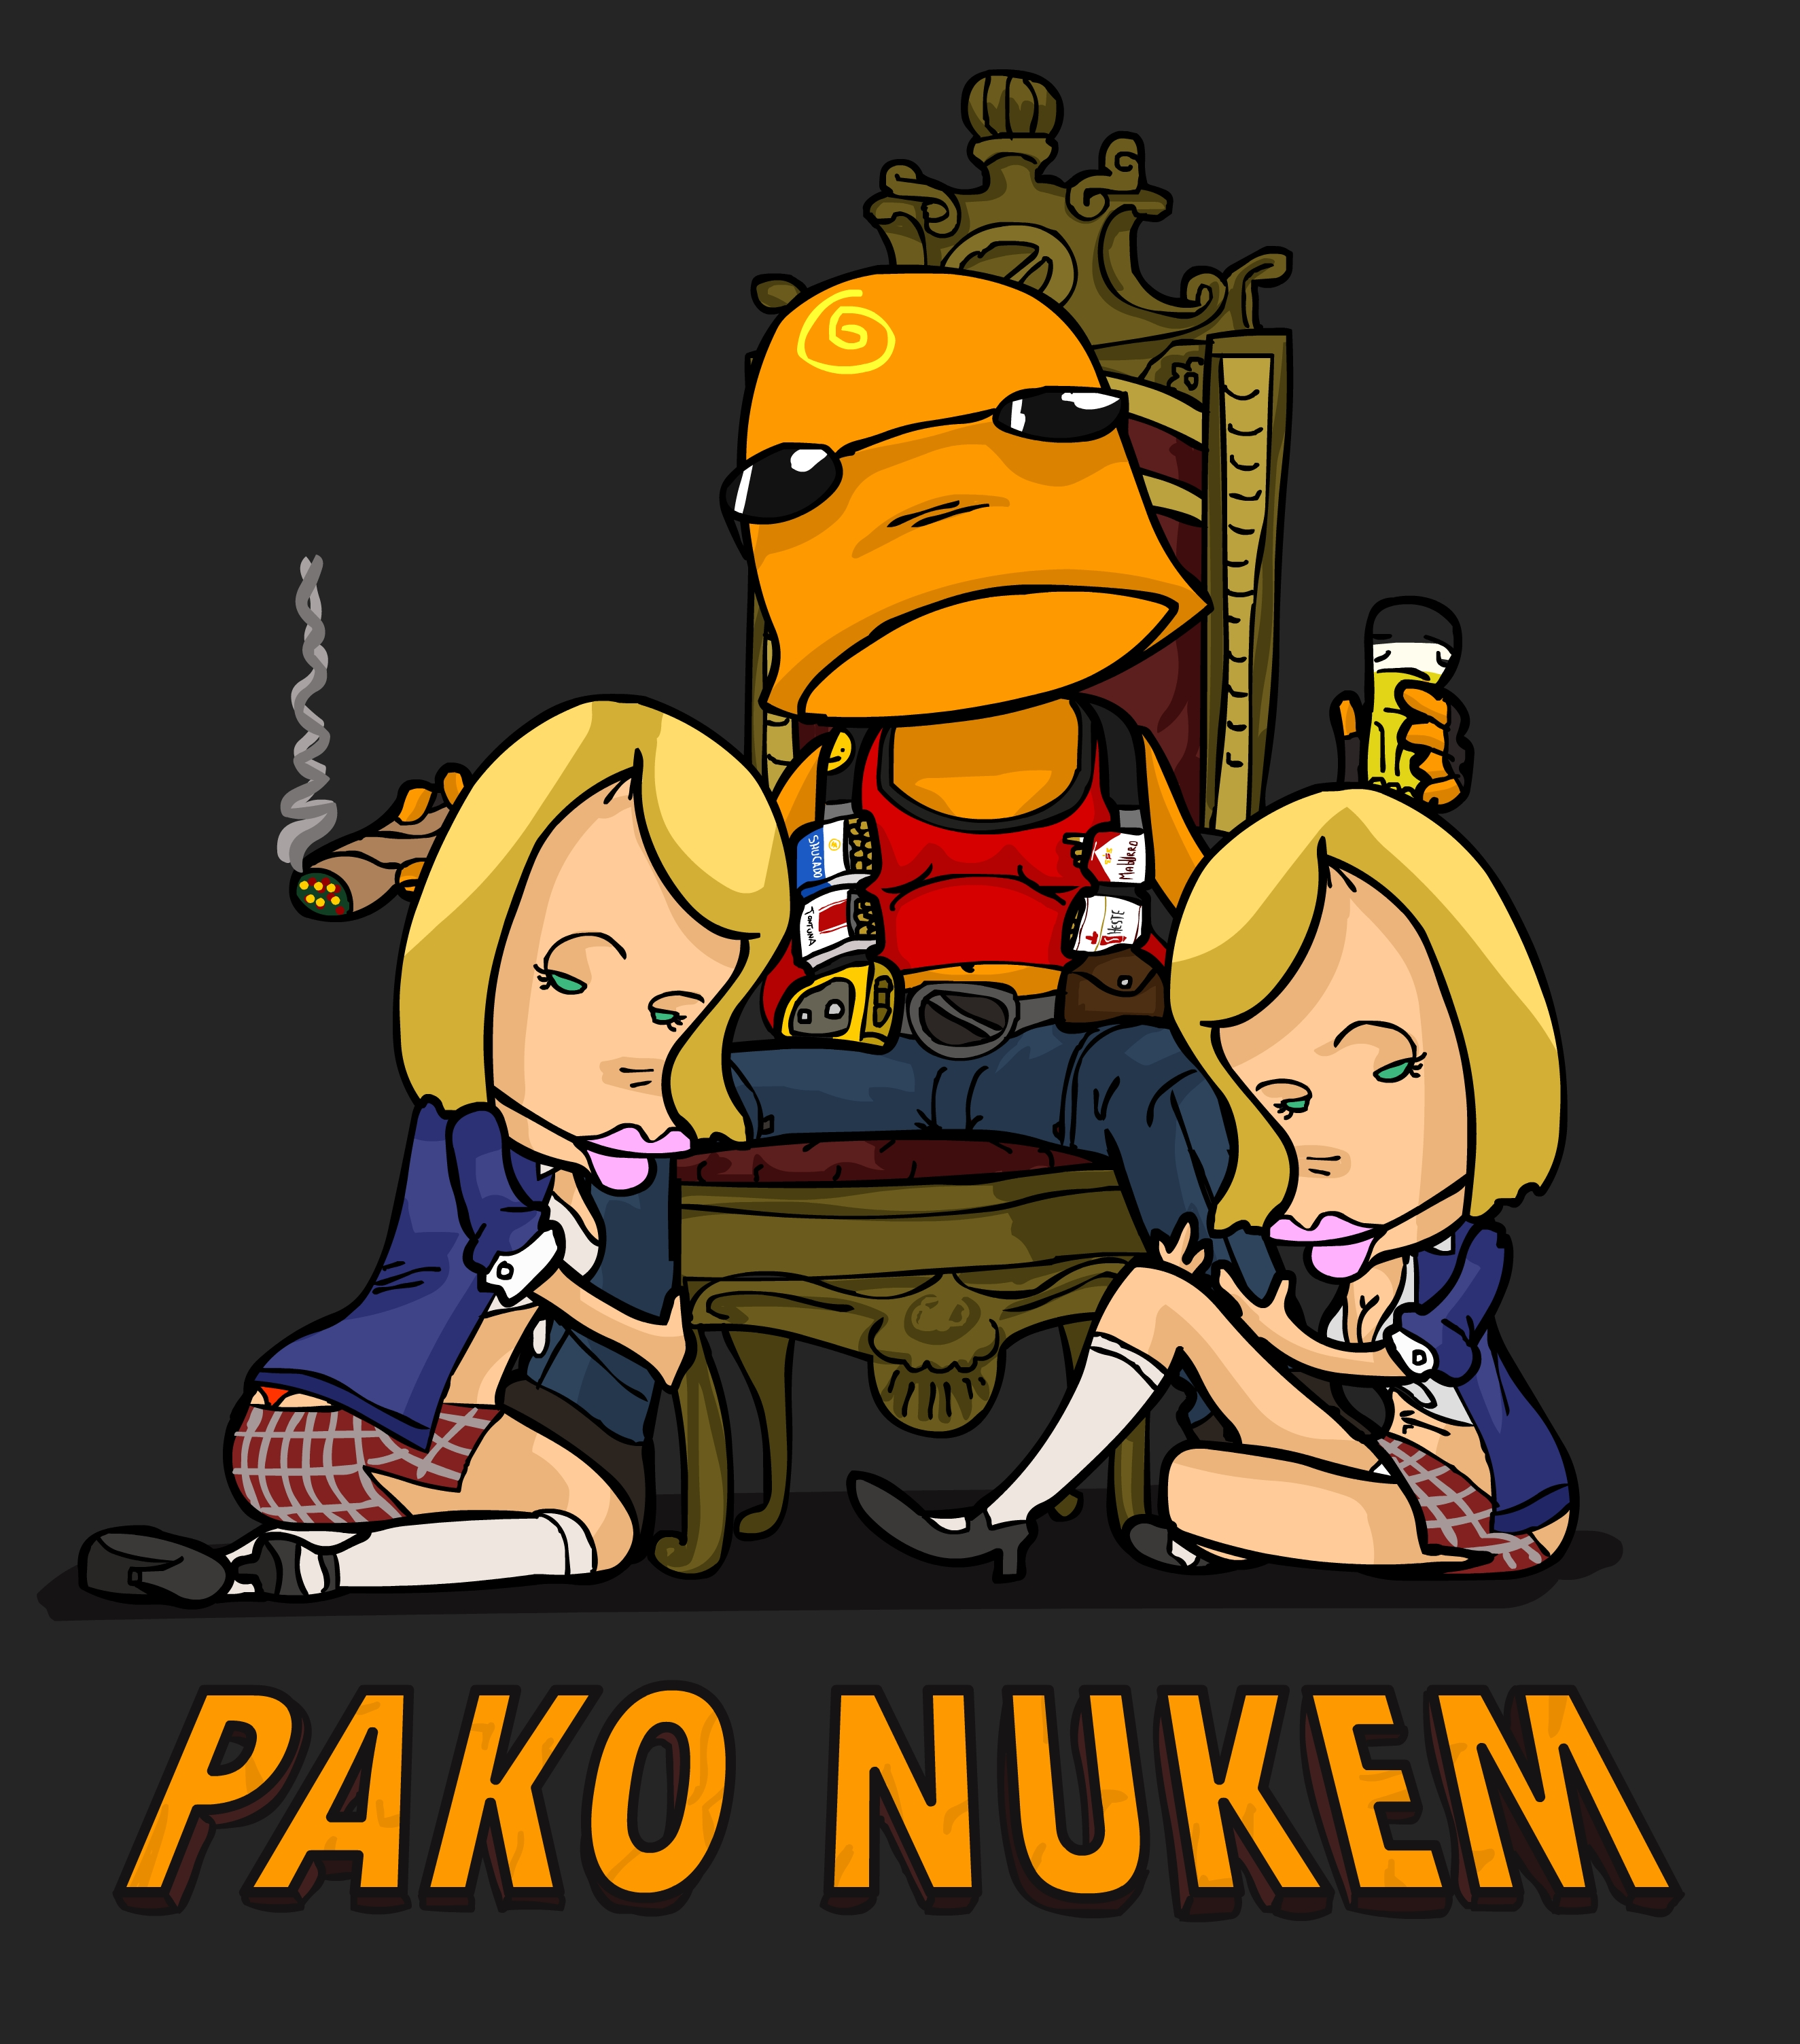 Pako Nukem